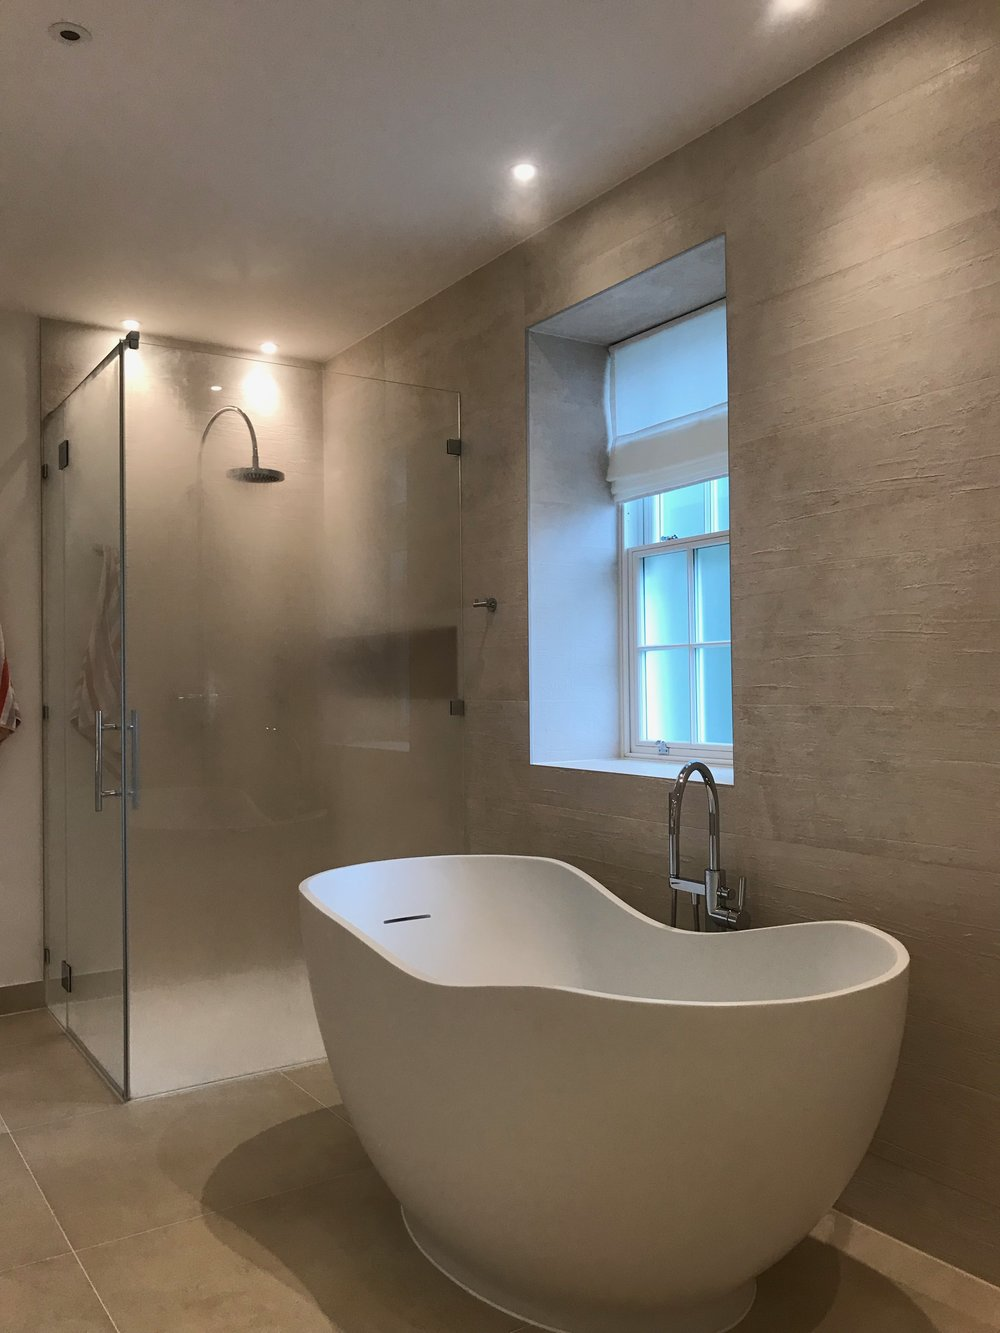 fixed shower screen.jpeg